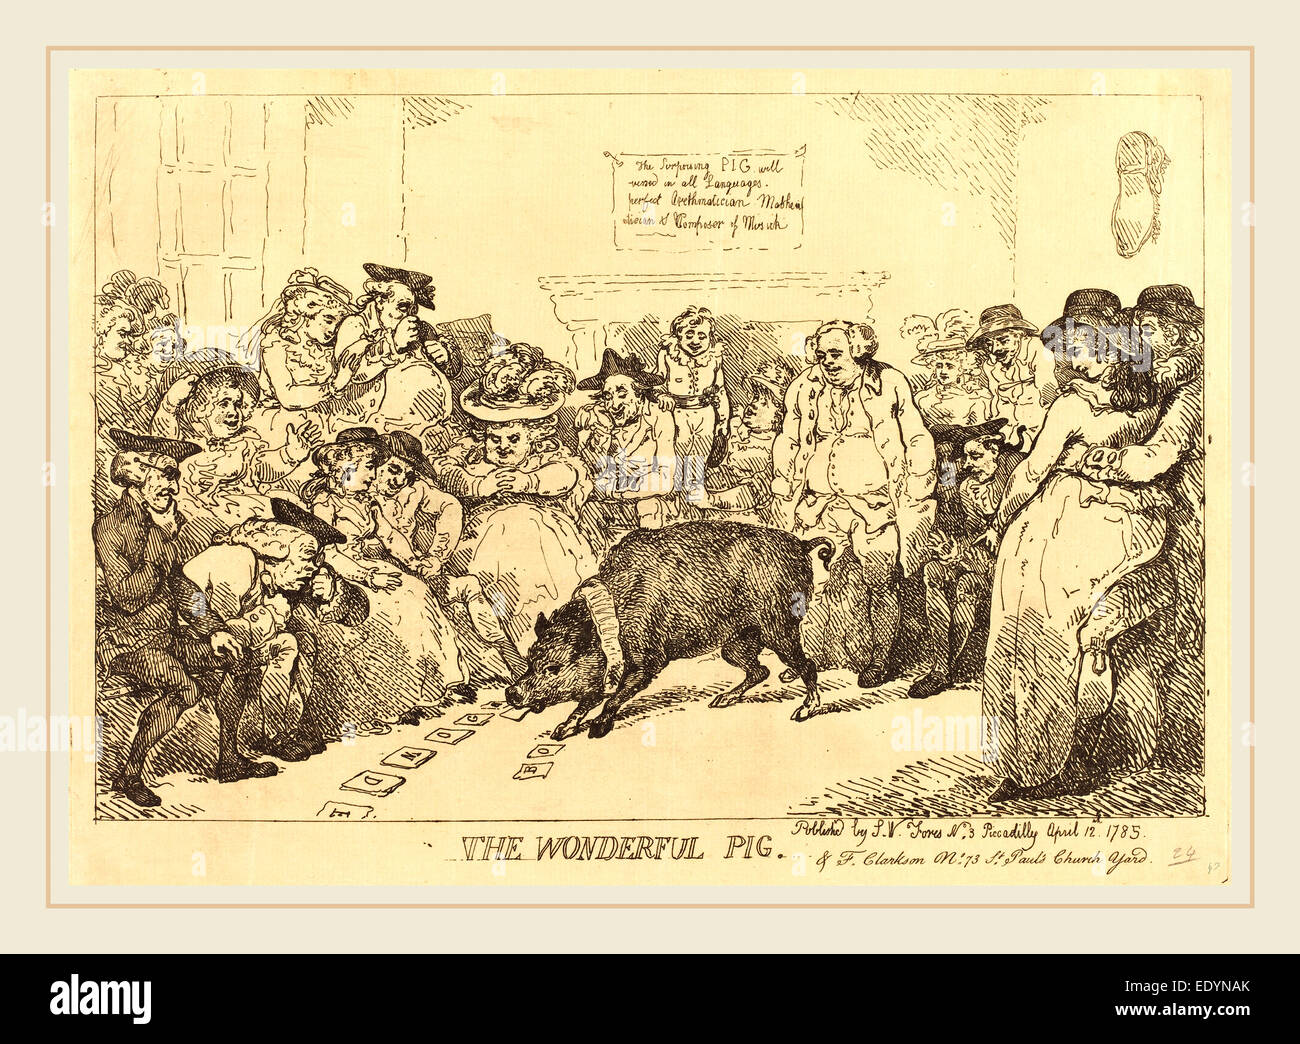 Thomas Rowlandson, British (1756-1827), The Wonderful Pig, 1785,